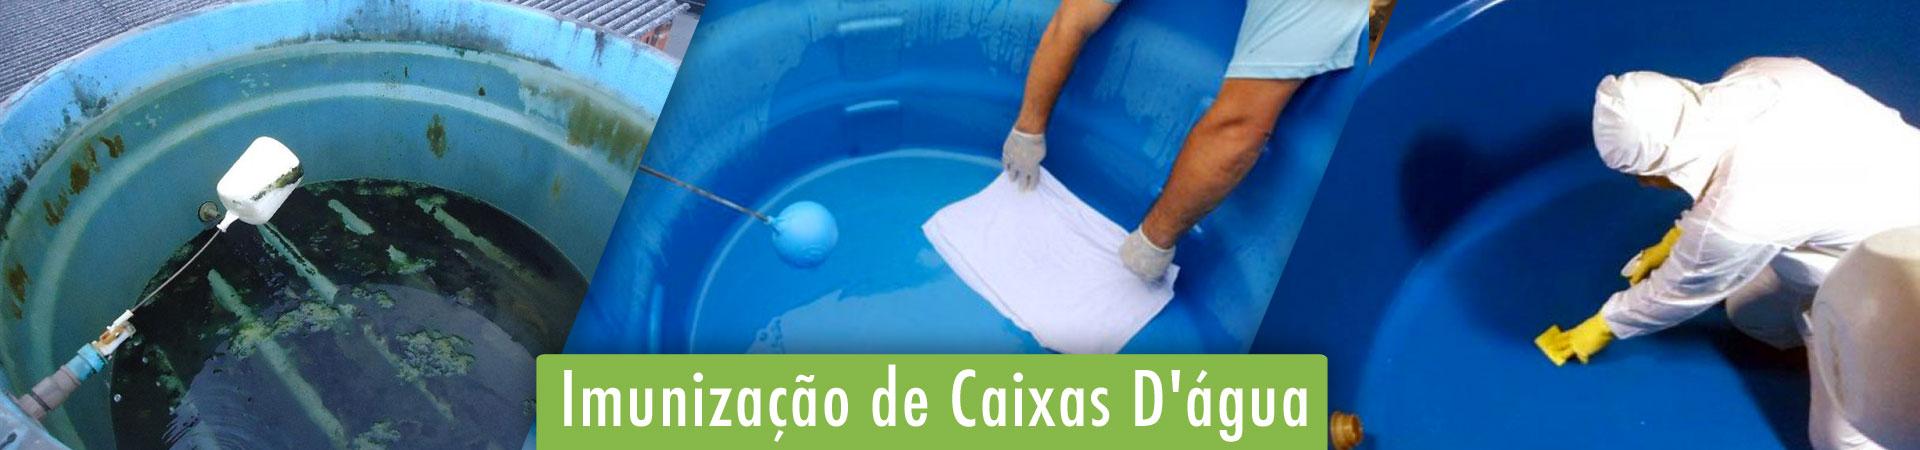 limpeza-de-caixa-dagua-em-braganca-paulista-sp